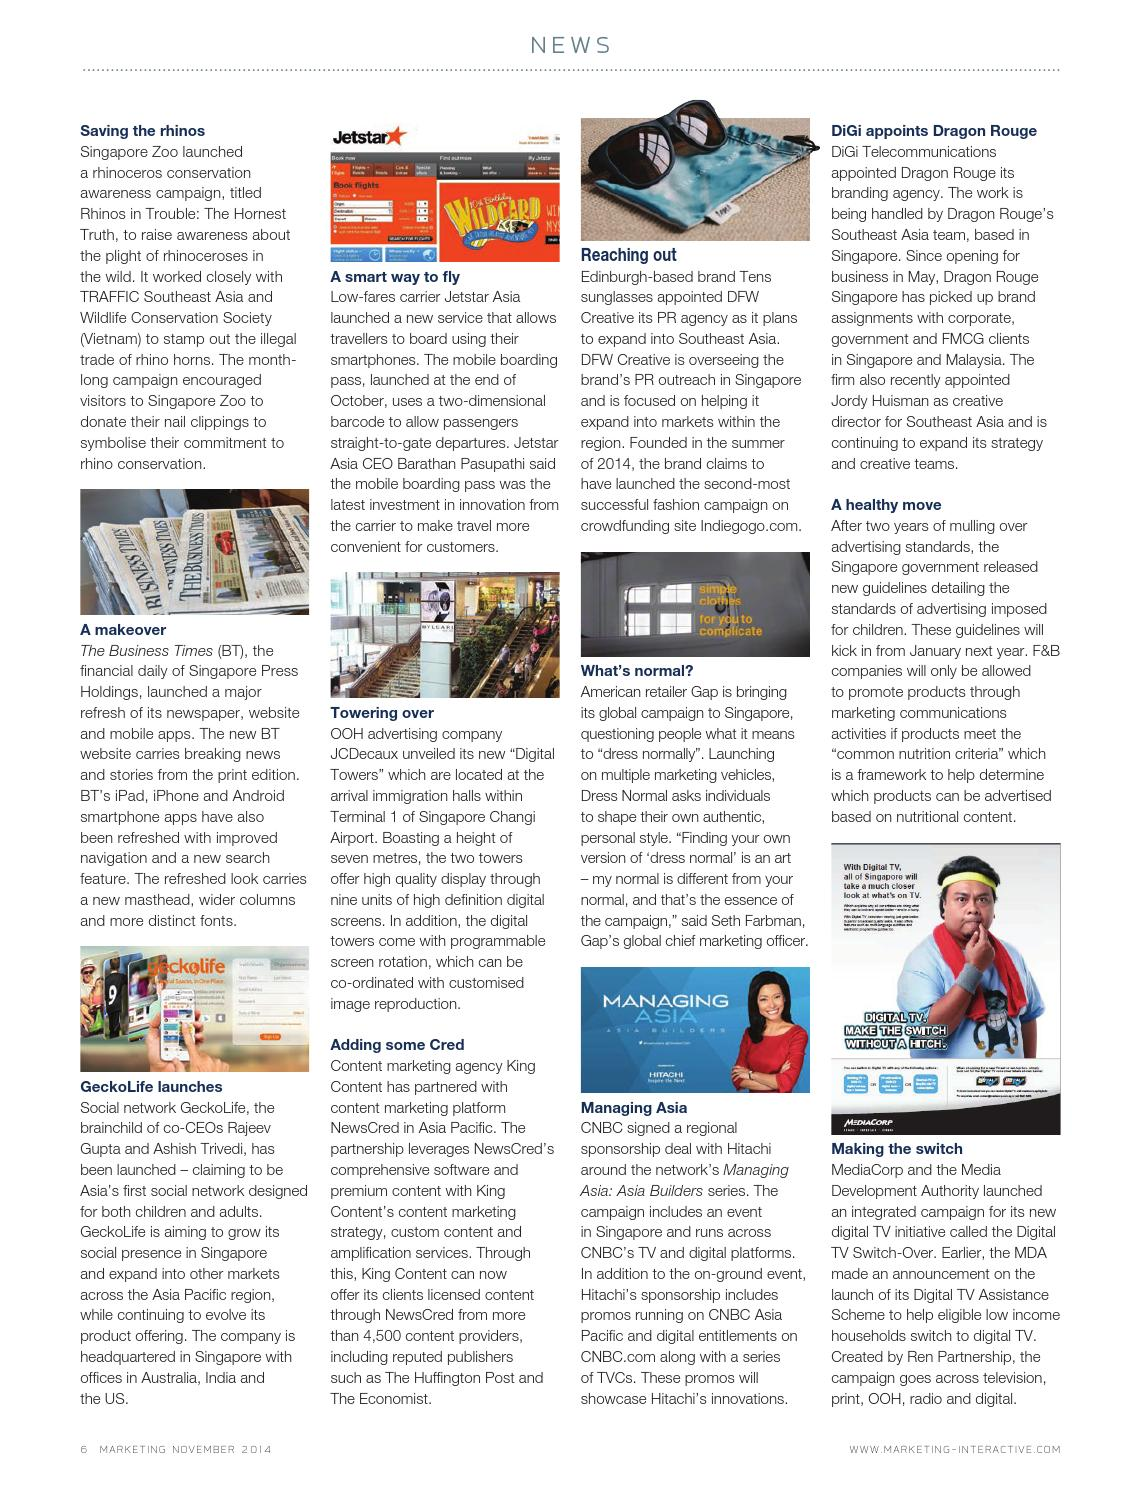 Marketing Magazine Sg Nov 2014 By Group Issuu 3 Way Navigation Switch